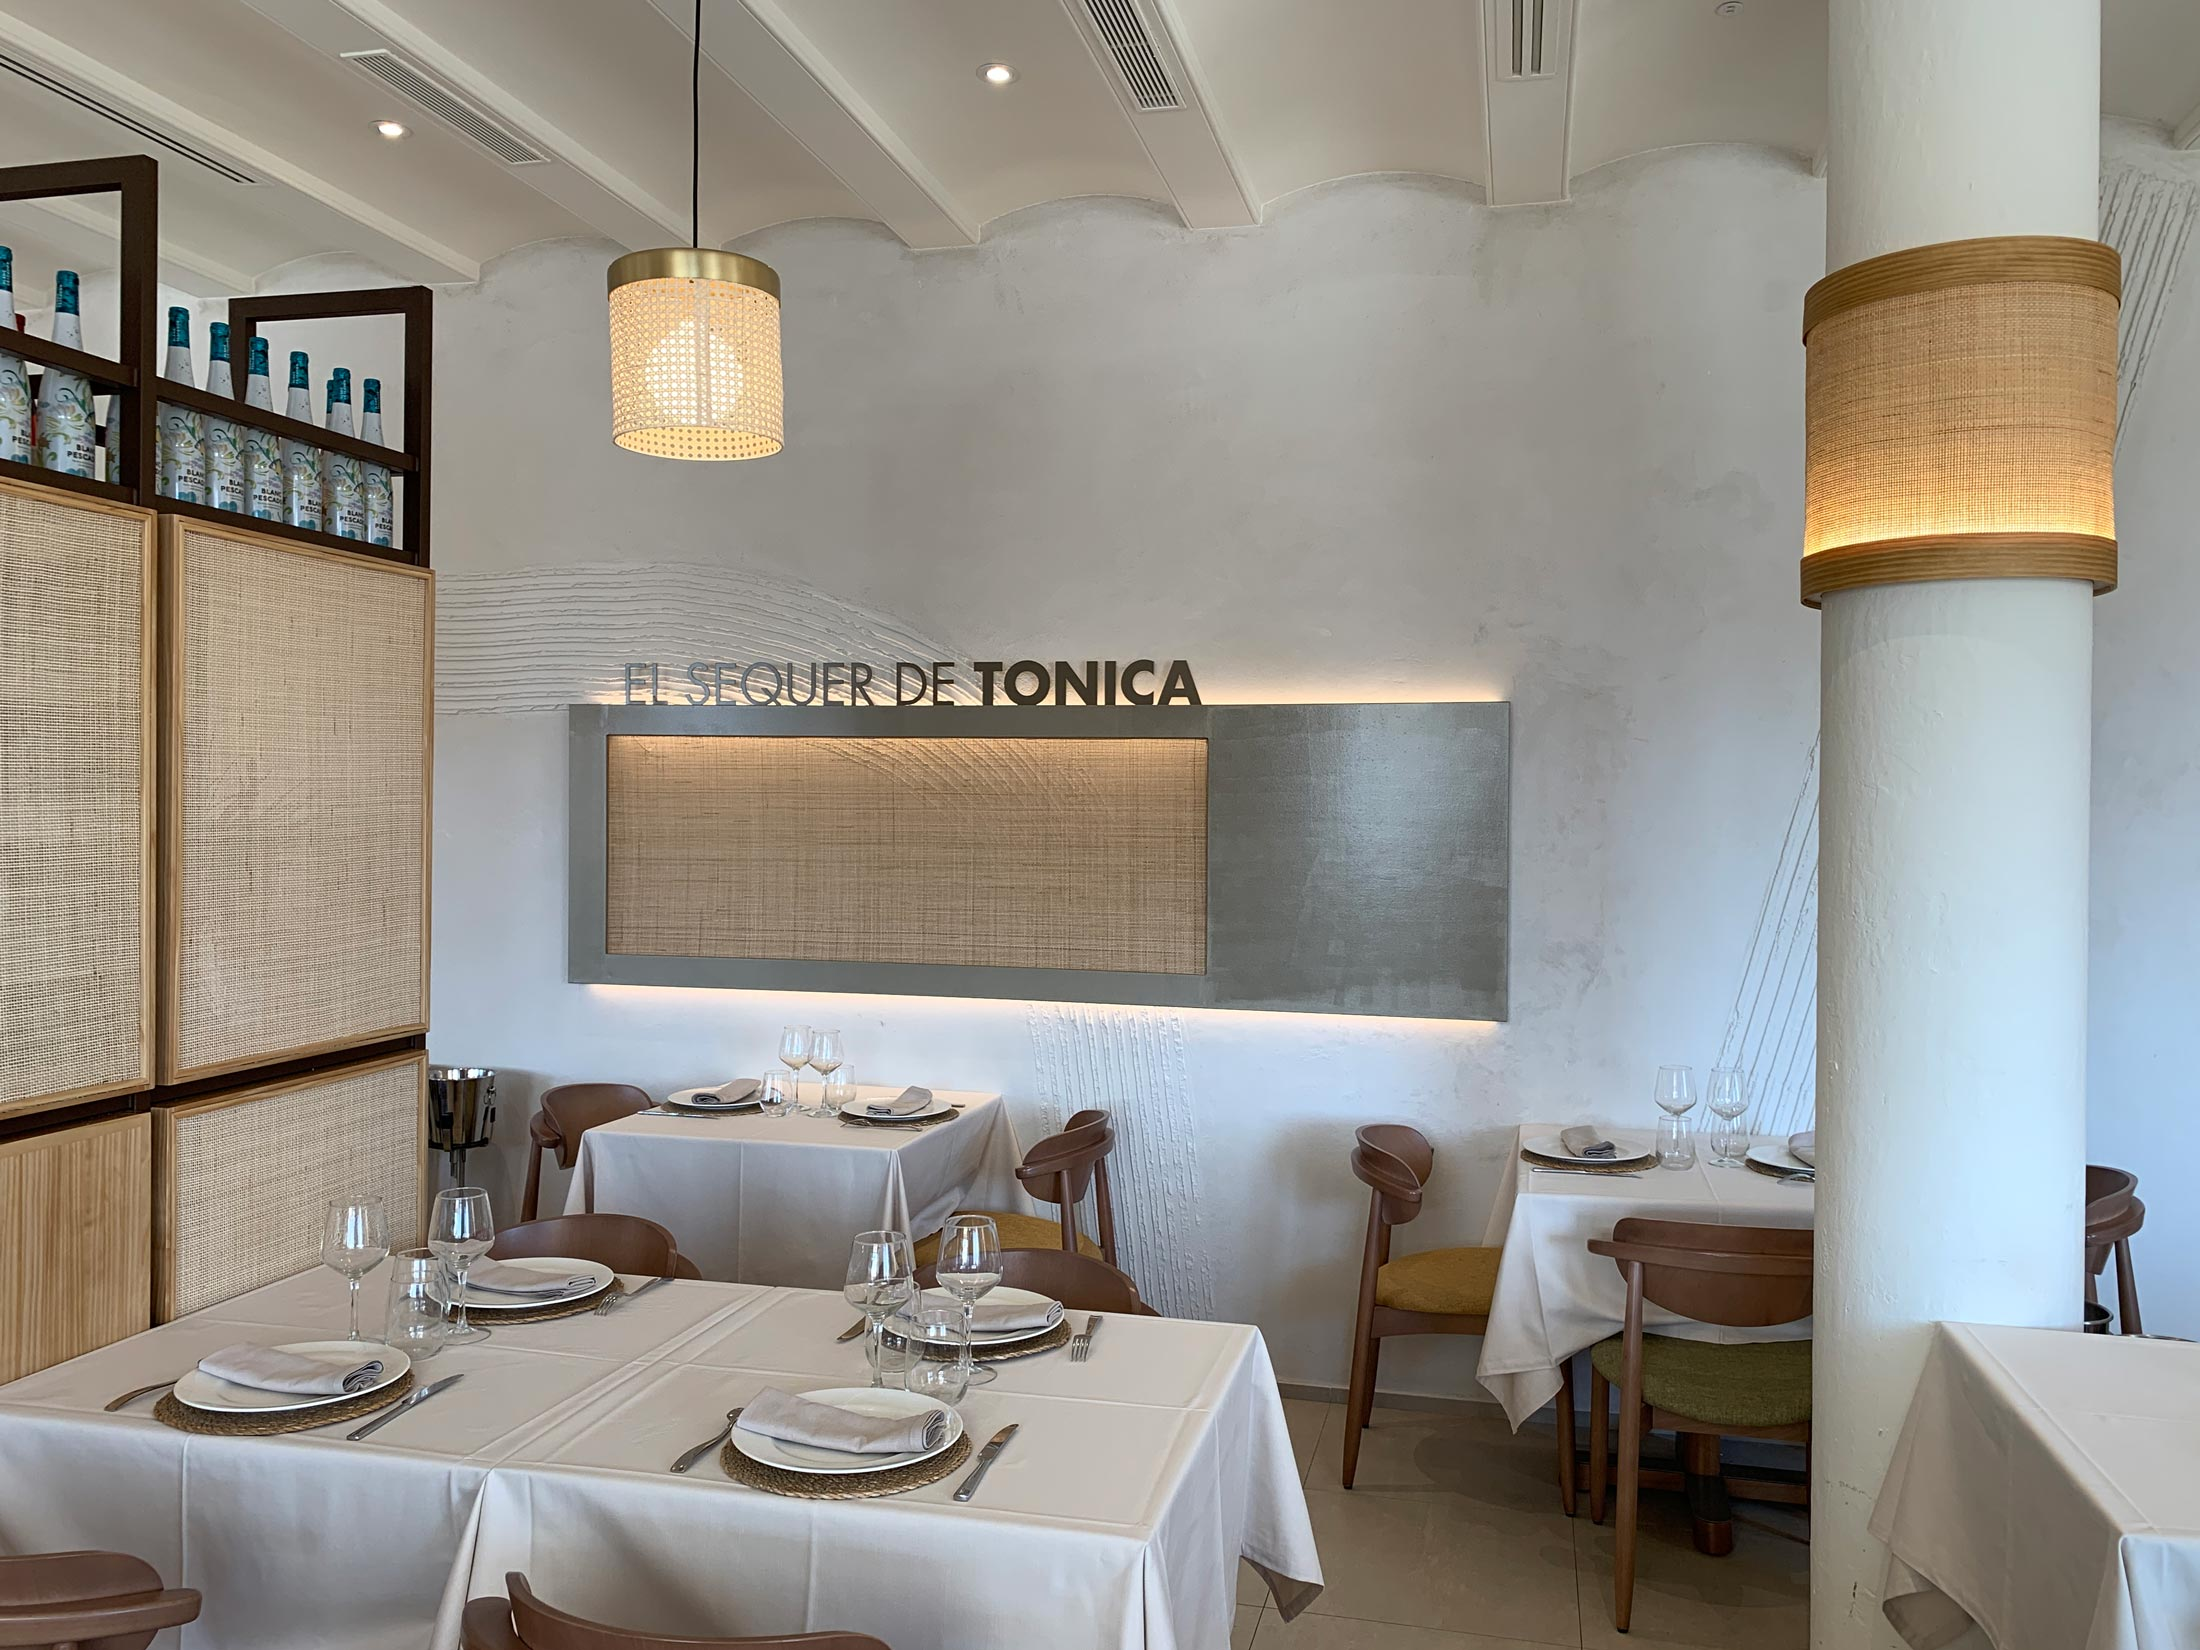 Foto-Restaurante el Sequer de Tonica